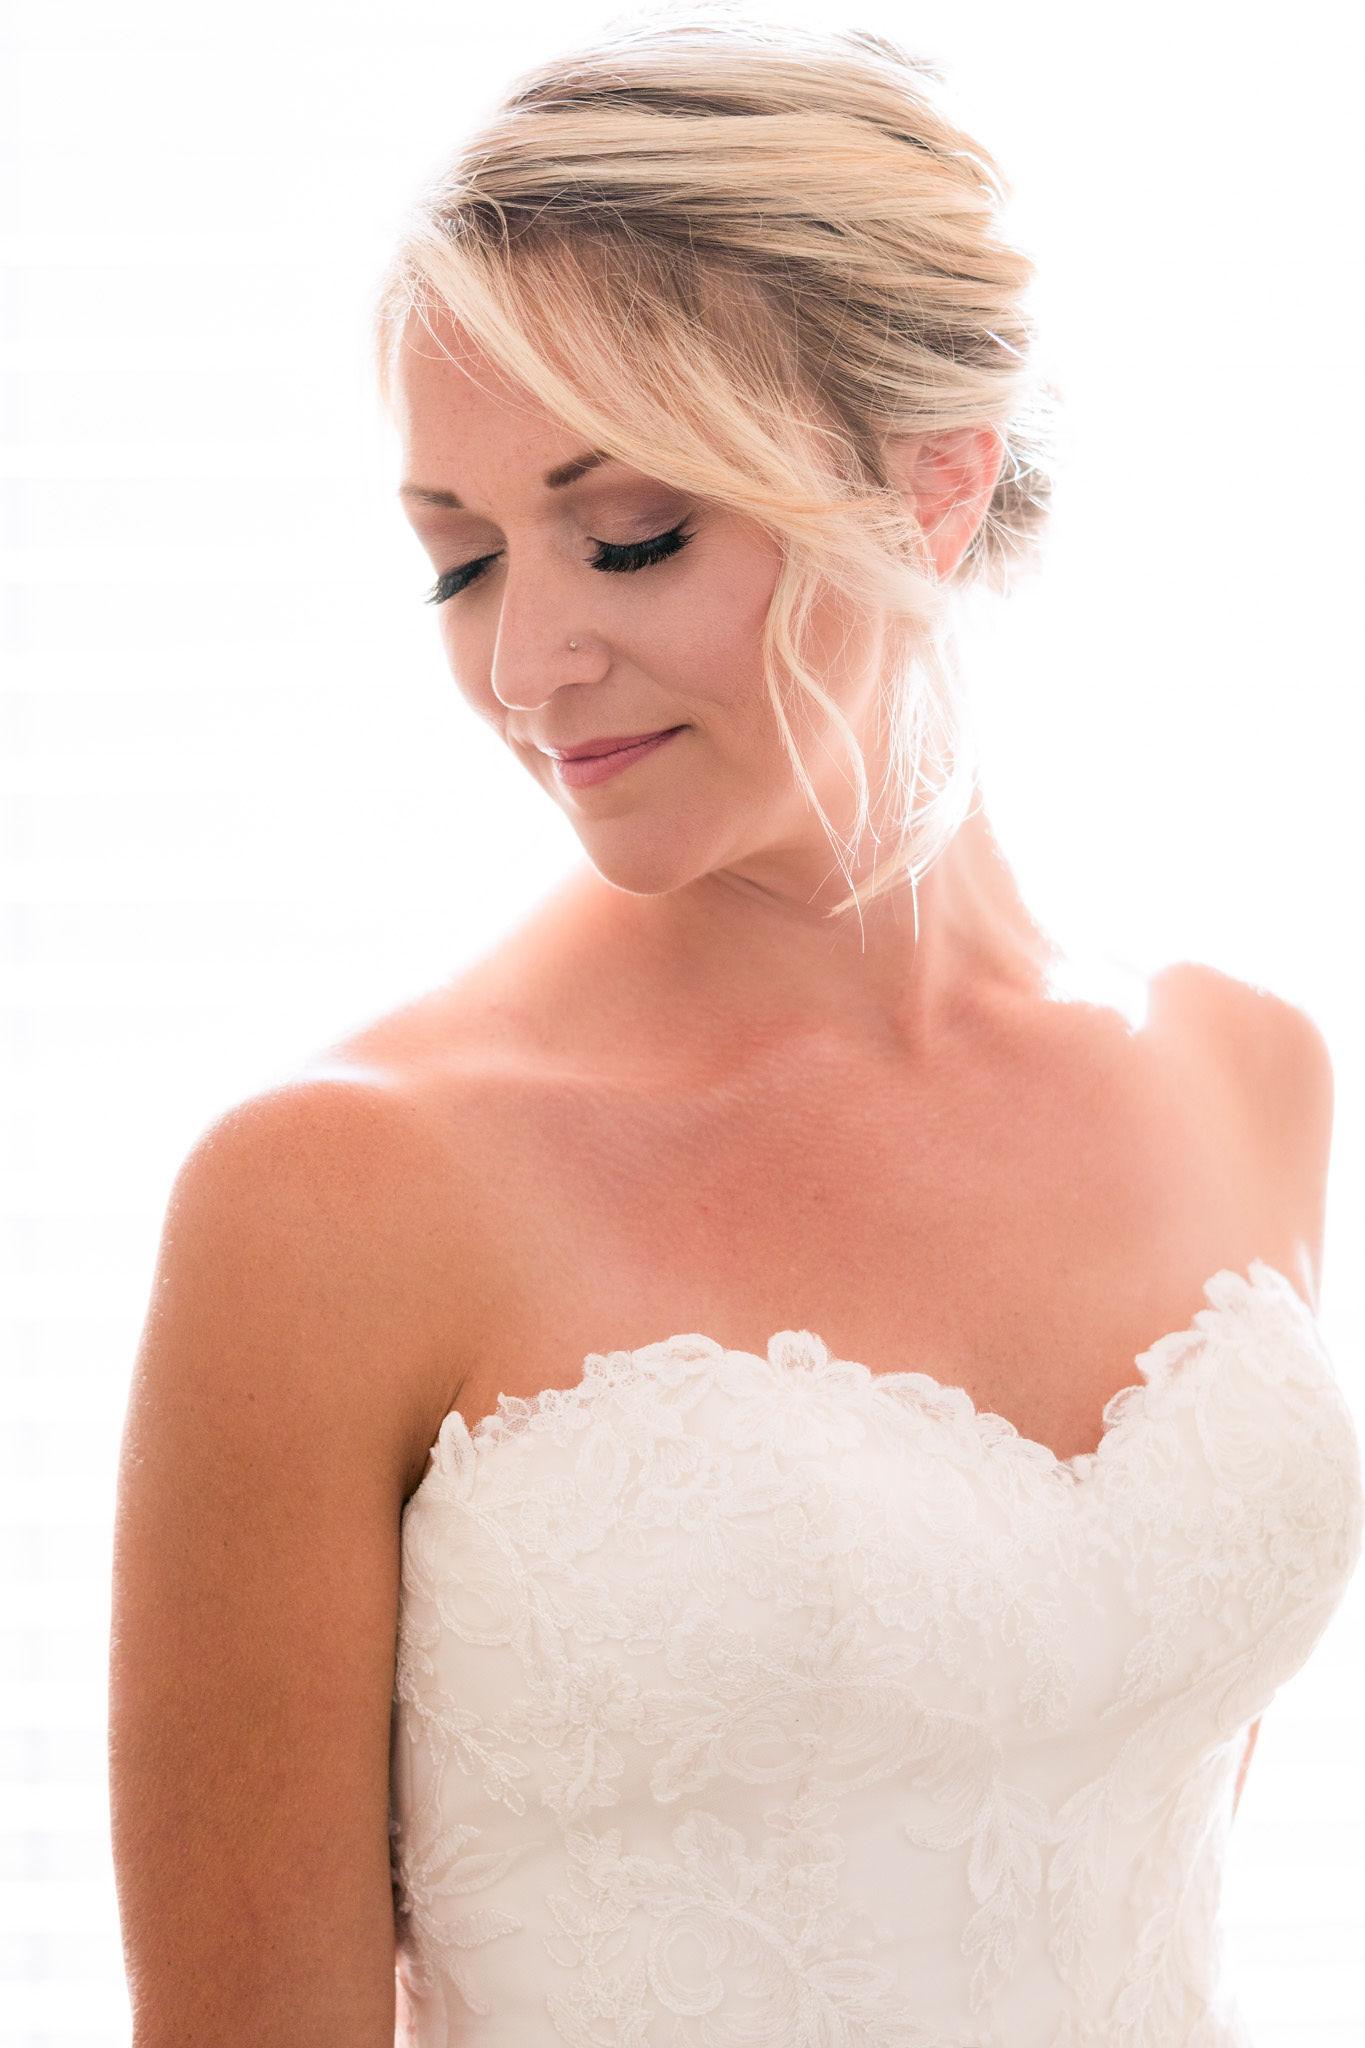 Amber's Bridal Portrait Session | Chicago Wedding Photographer-09.jpg